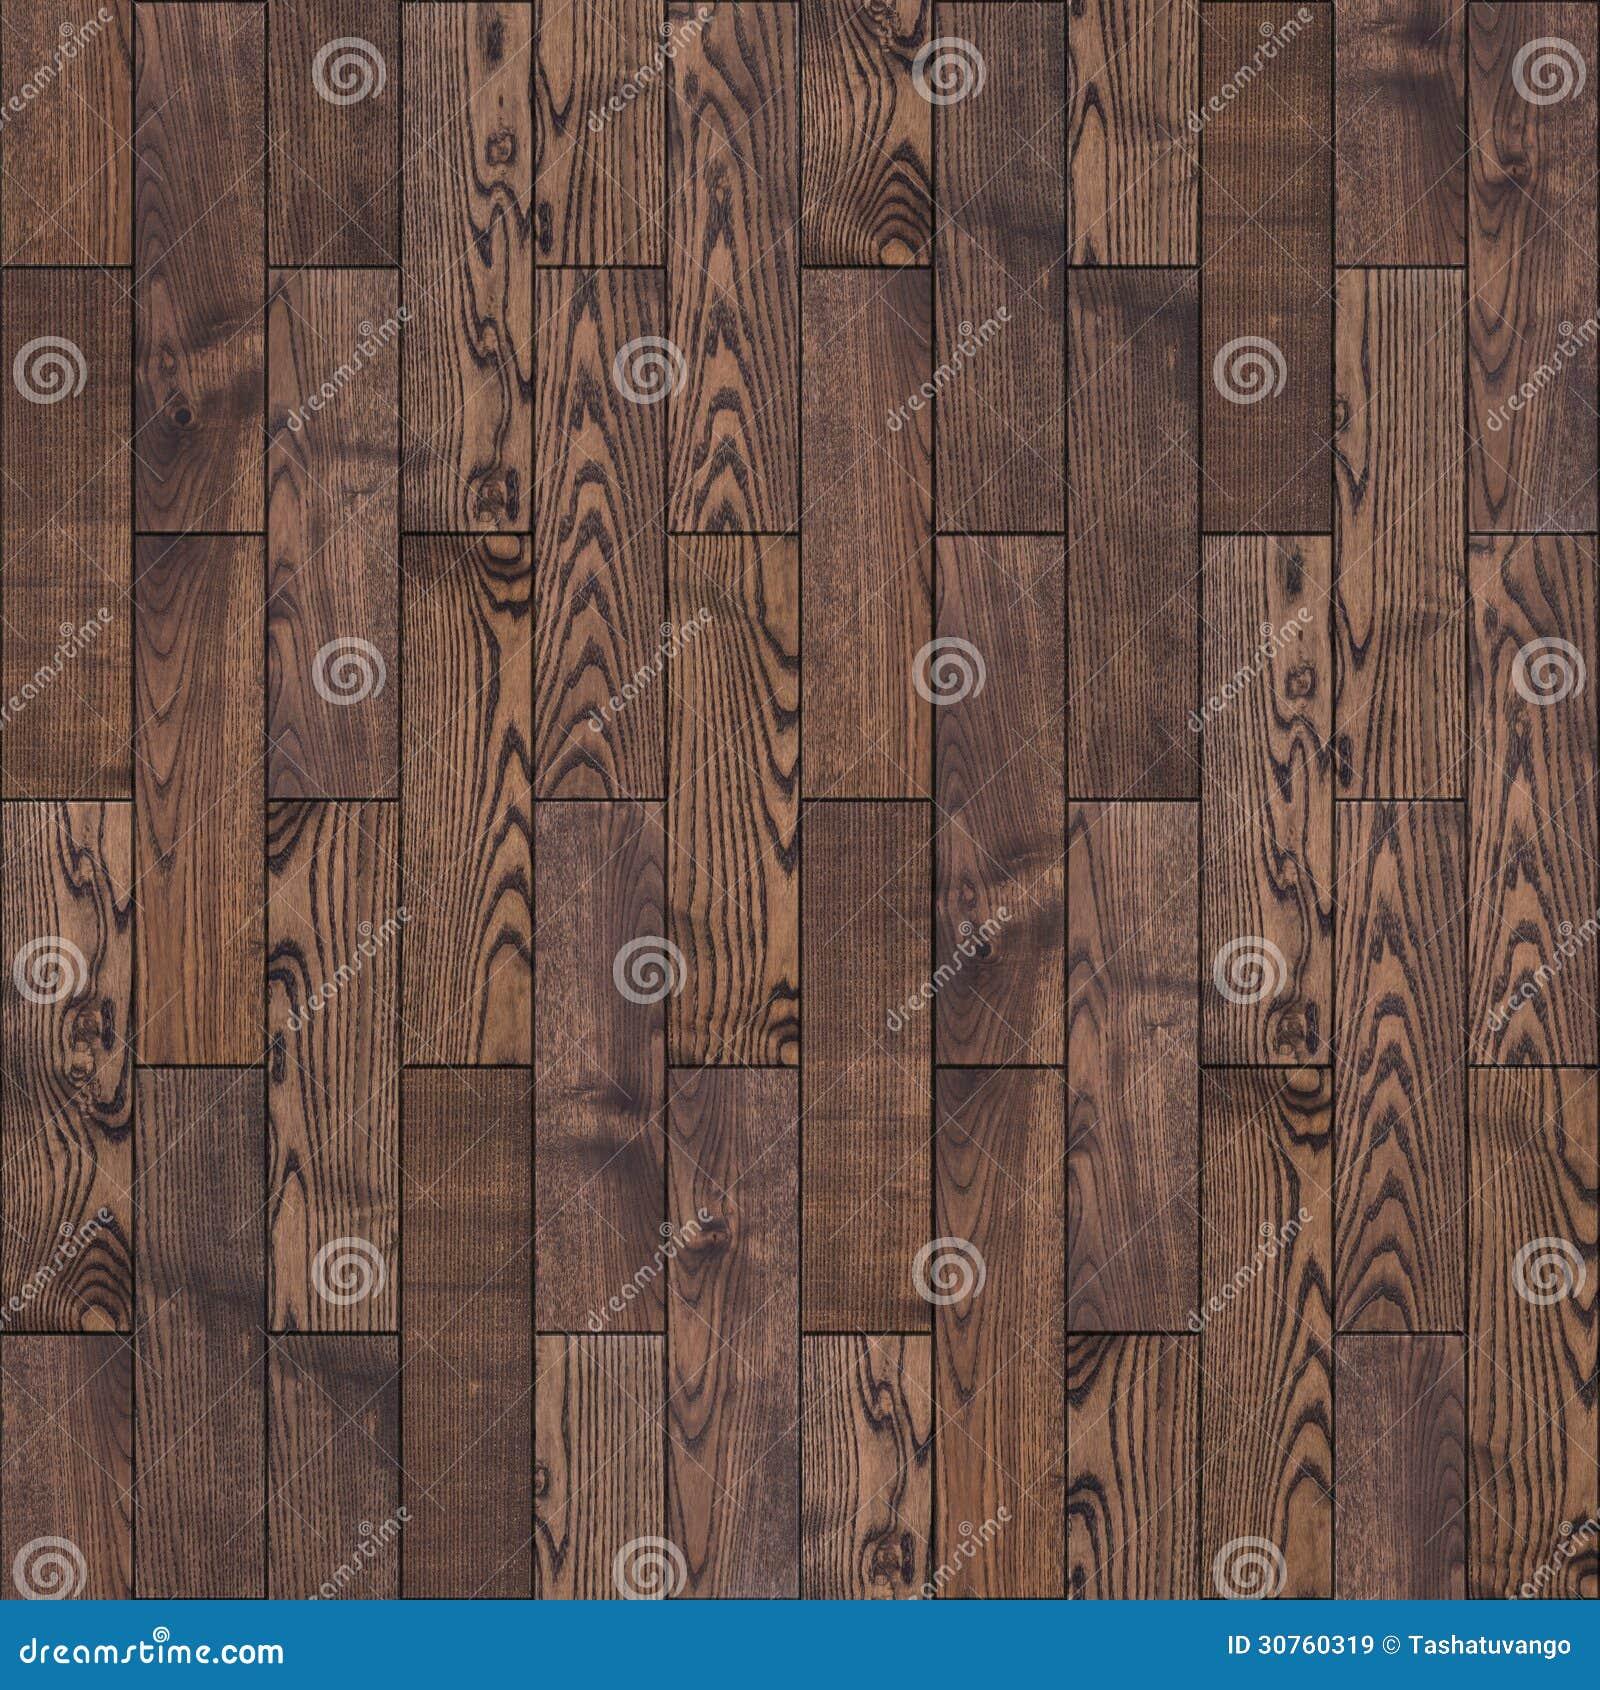 Brown Wood Parquet Floor. Seamless Texture.